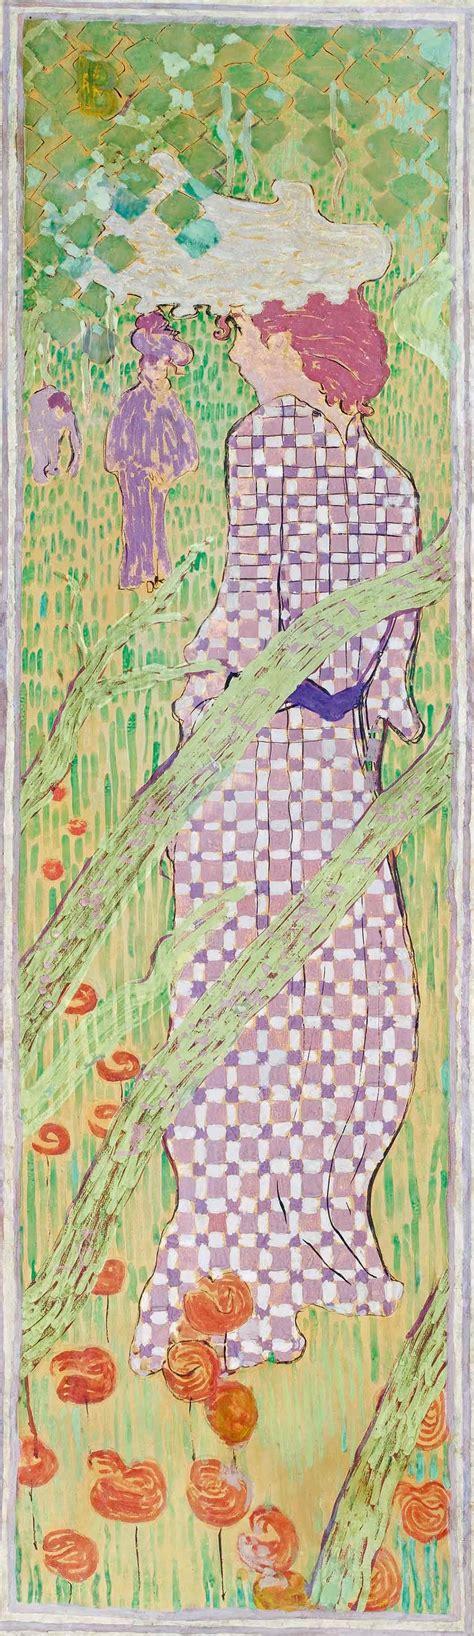 donne in giardino donne in giardino donna in abito a quadri arte